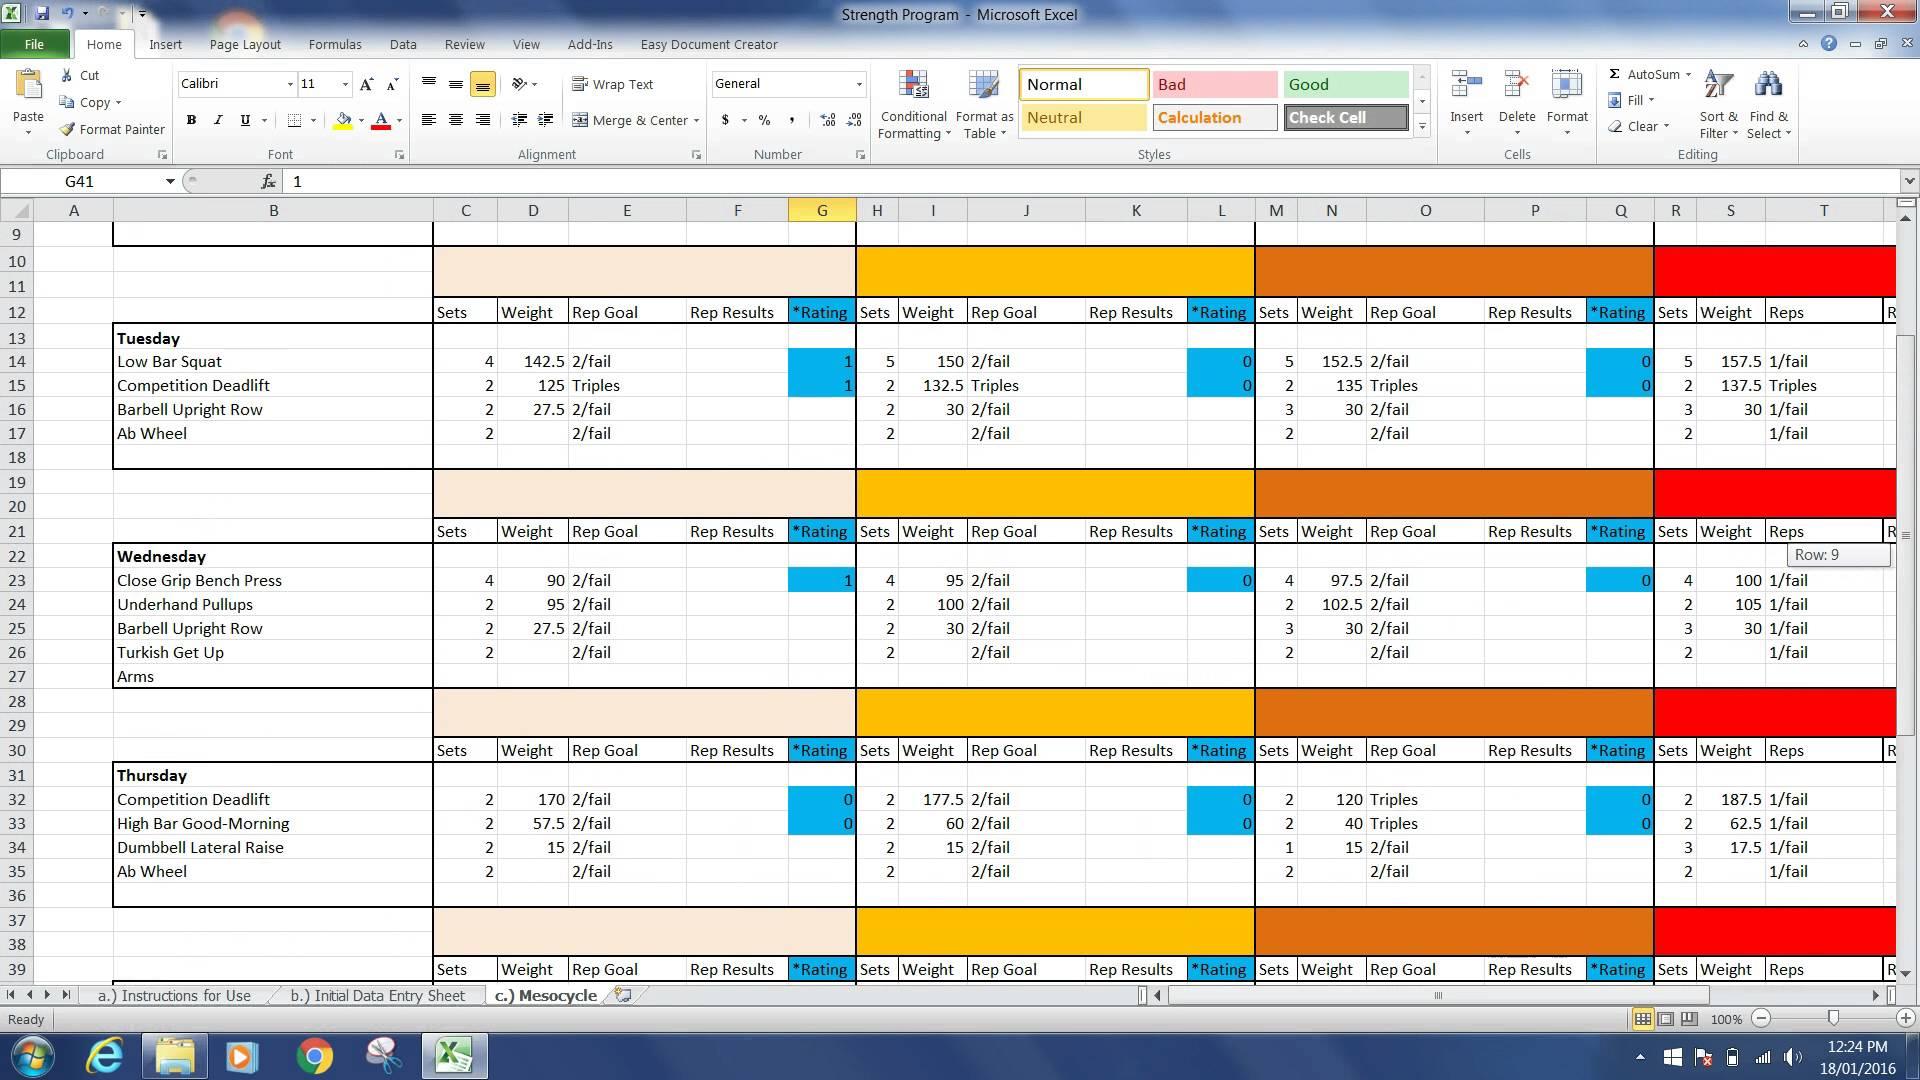 Powerlifting Excel Spreadsheet